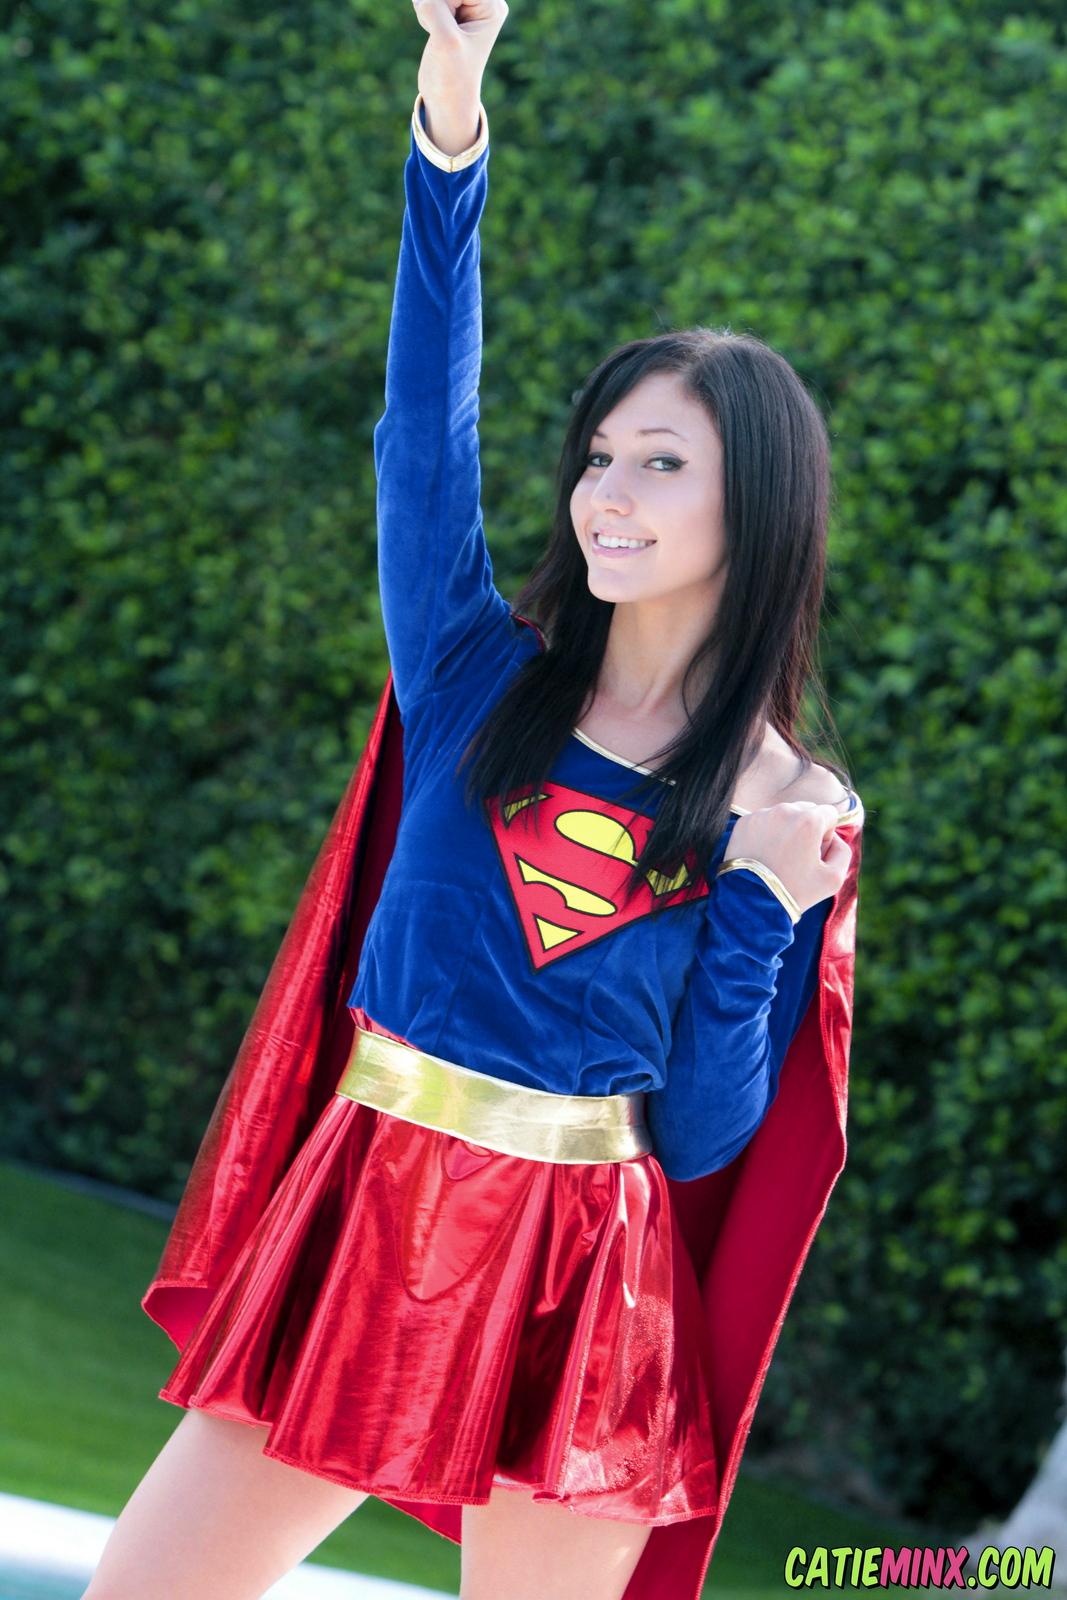 catie-minx-supergirl-costiume-poolside-young-brunette-nude-04